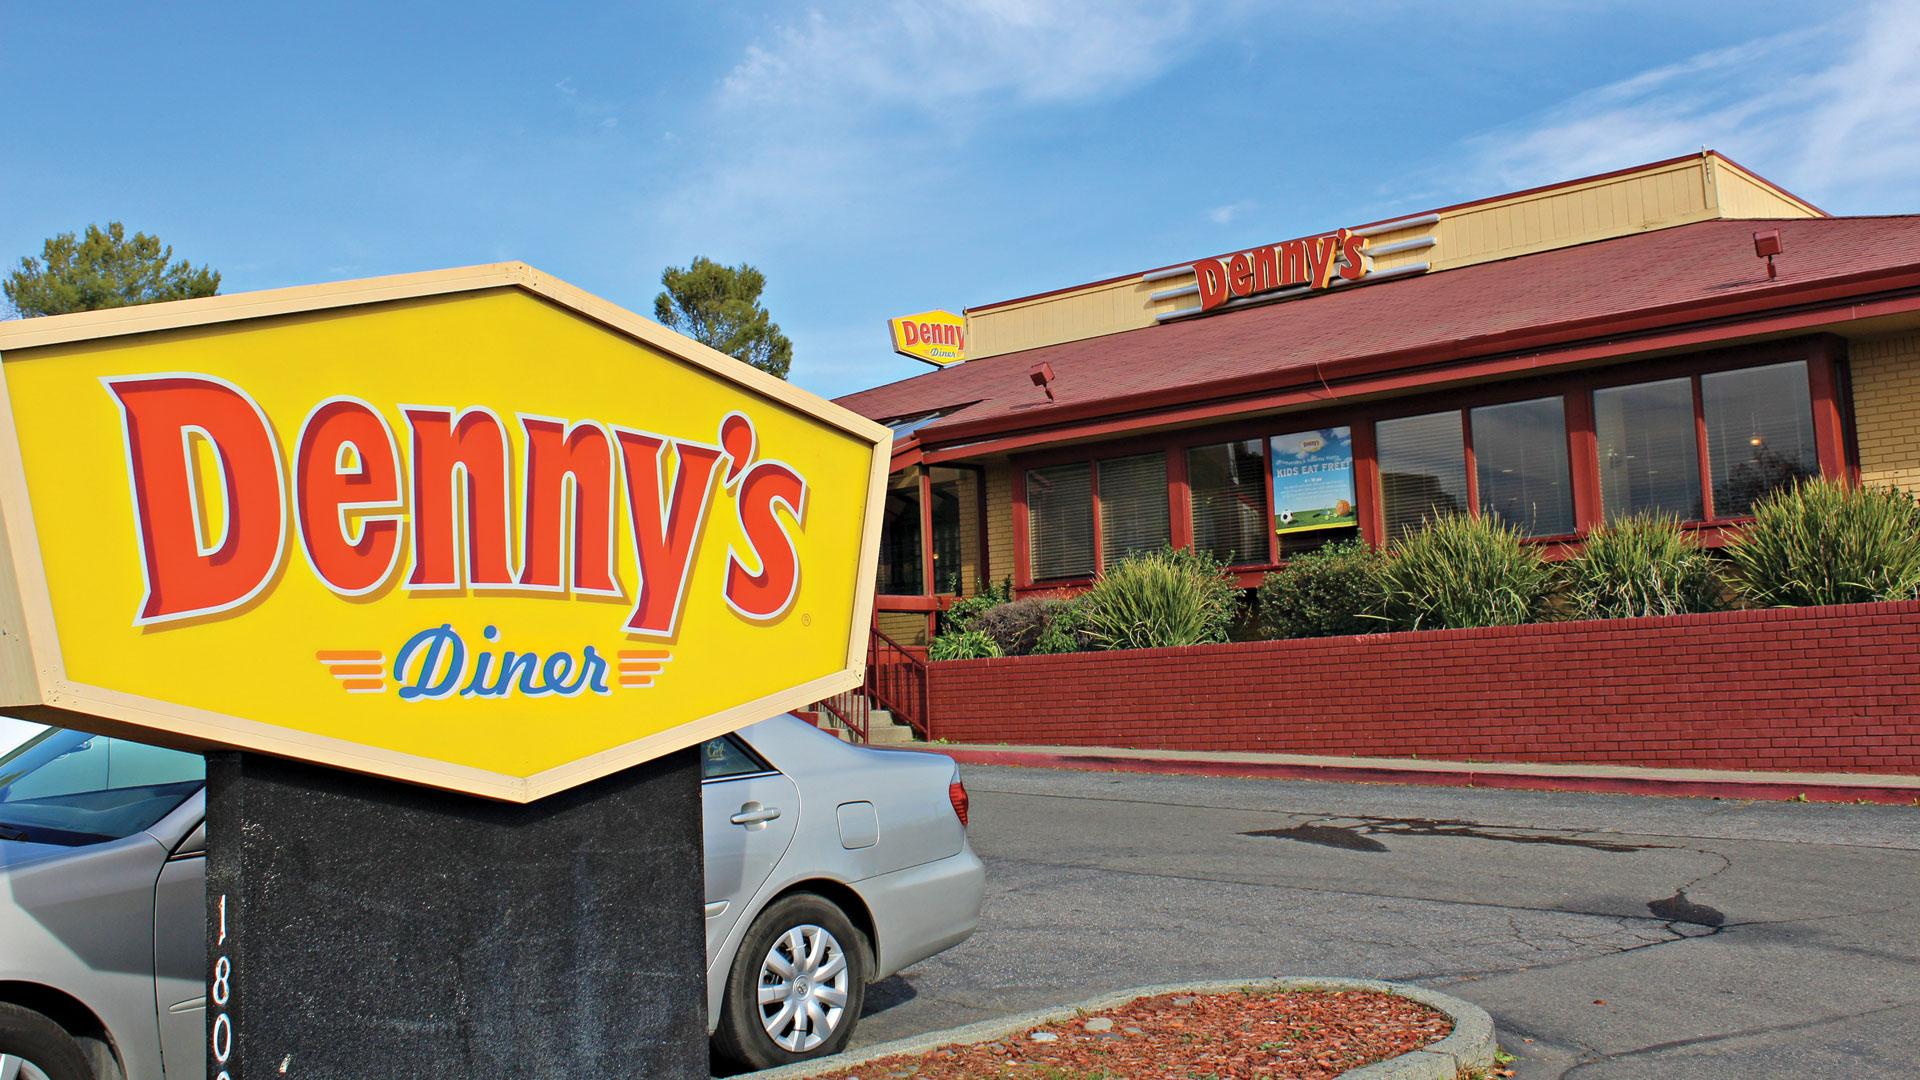 Denny's-diner